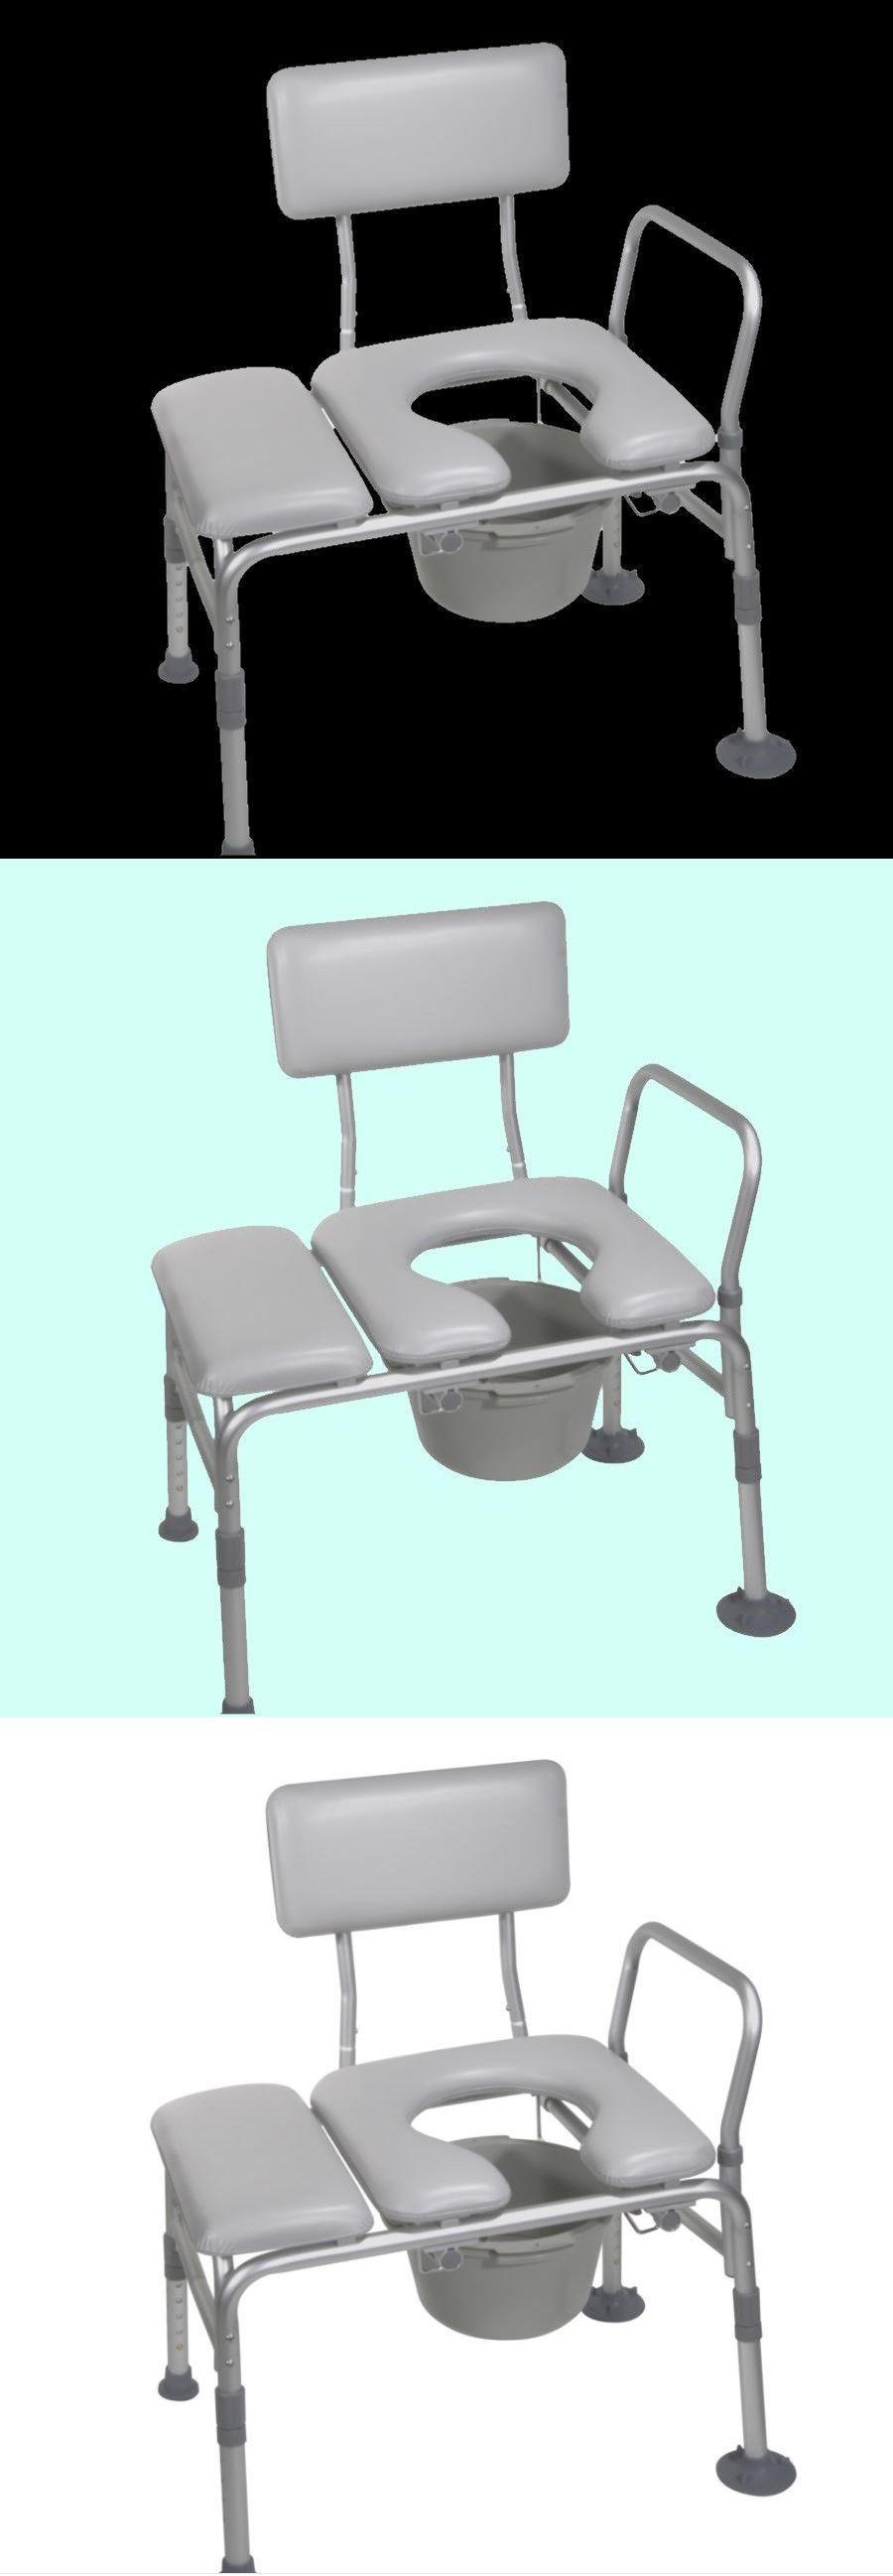 PADDED BATH TUB TRANSFER BENCH Commode Seat Shower Handicap Bathtub ...